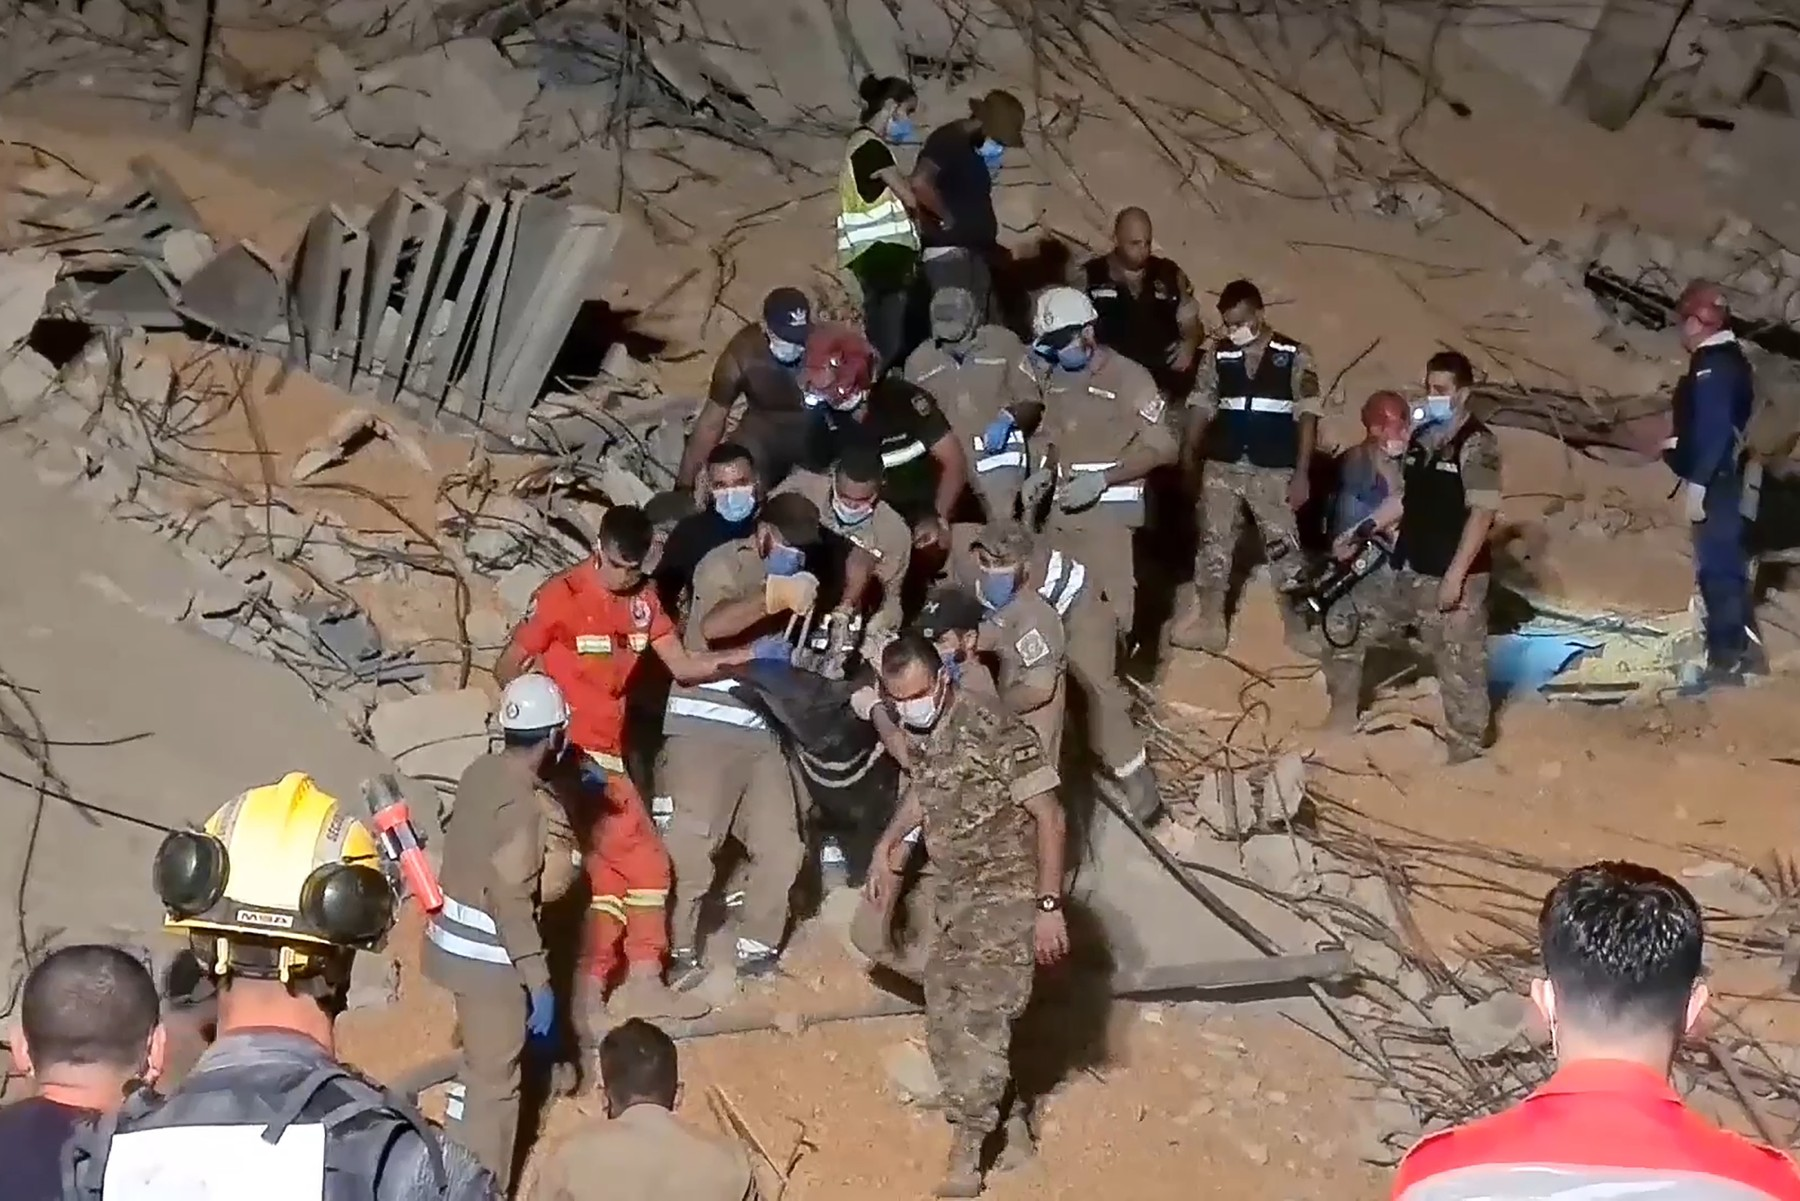 Un barbat din Beirut a fost gasit in viata de salvatorii voluntari dupa mai bine de 15 ore sub daramaturi